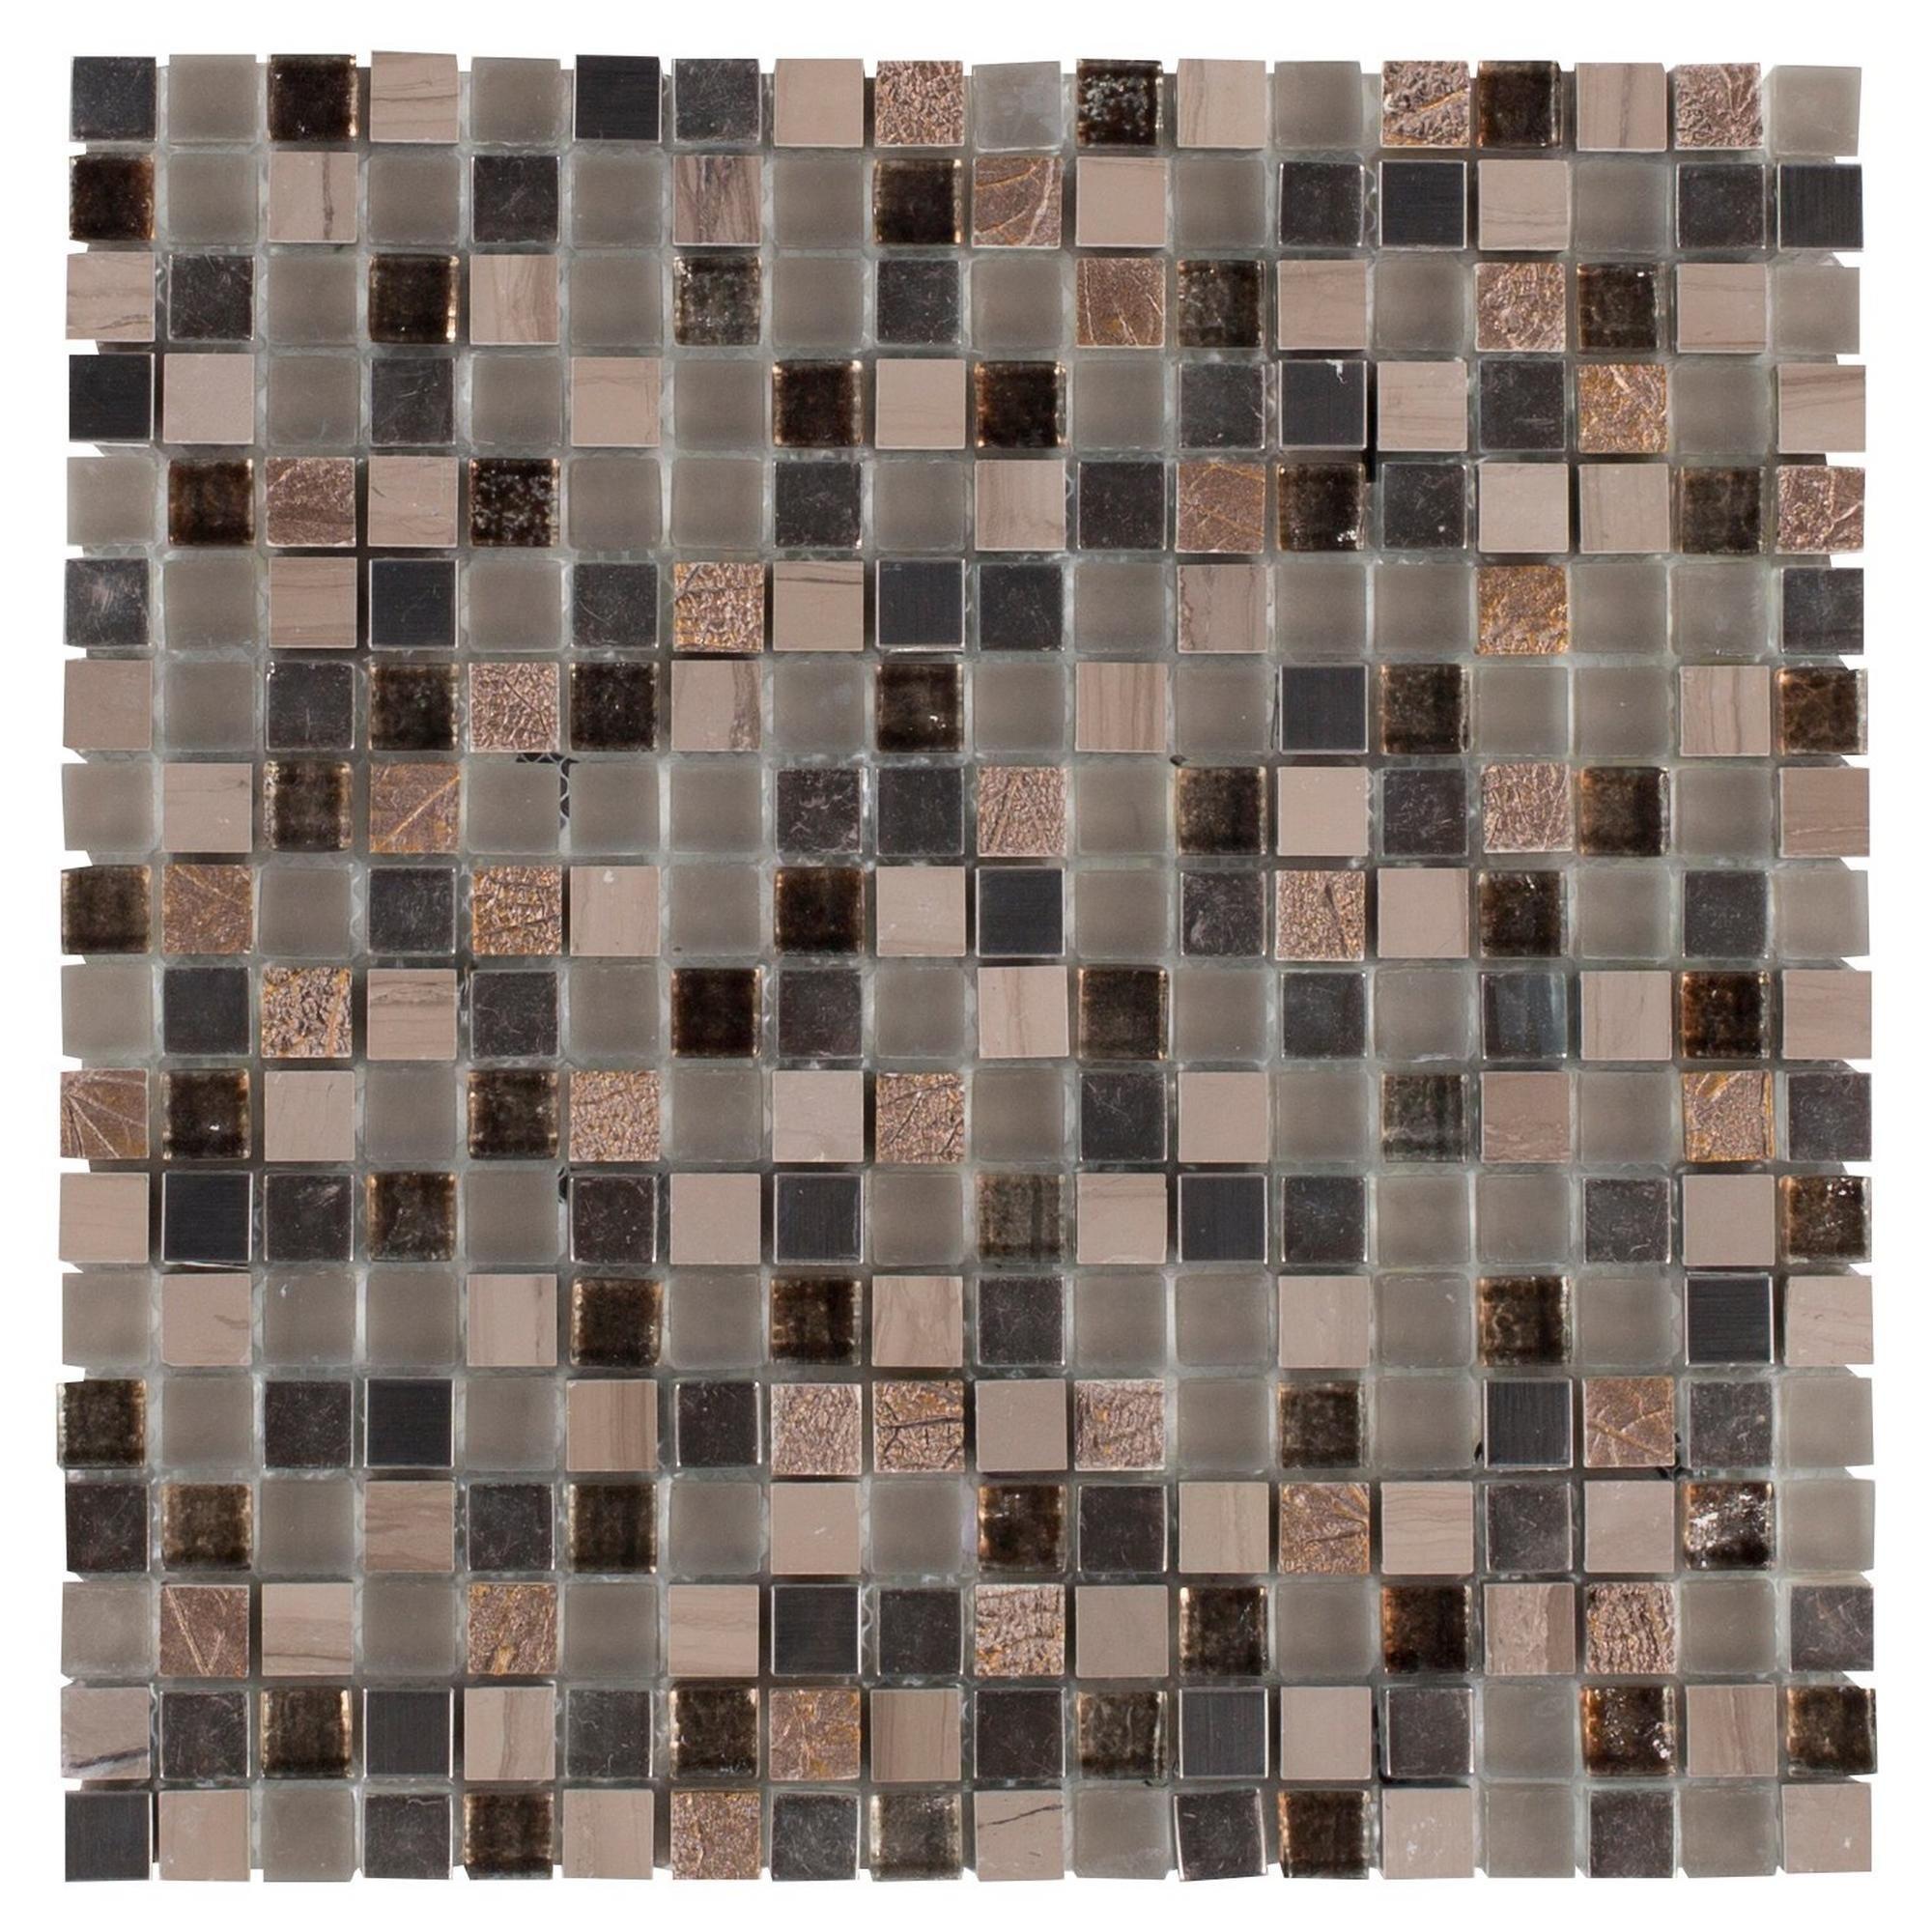 Cimarron Glass Mosaic Floor Decor Mosaic Glass Stone Mosaic Tile Stone Mosaic Wall